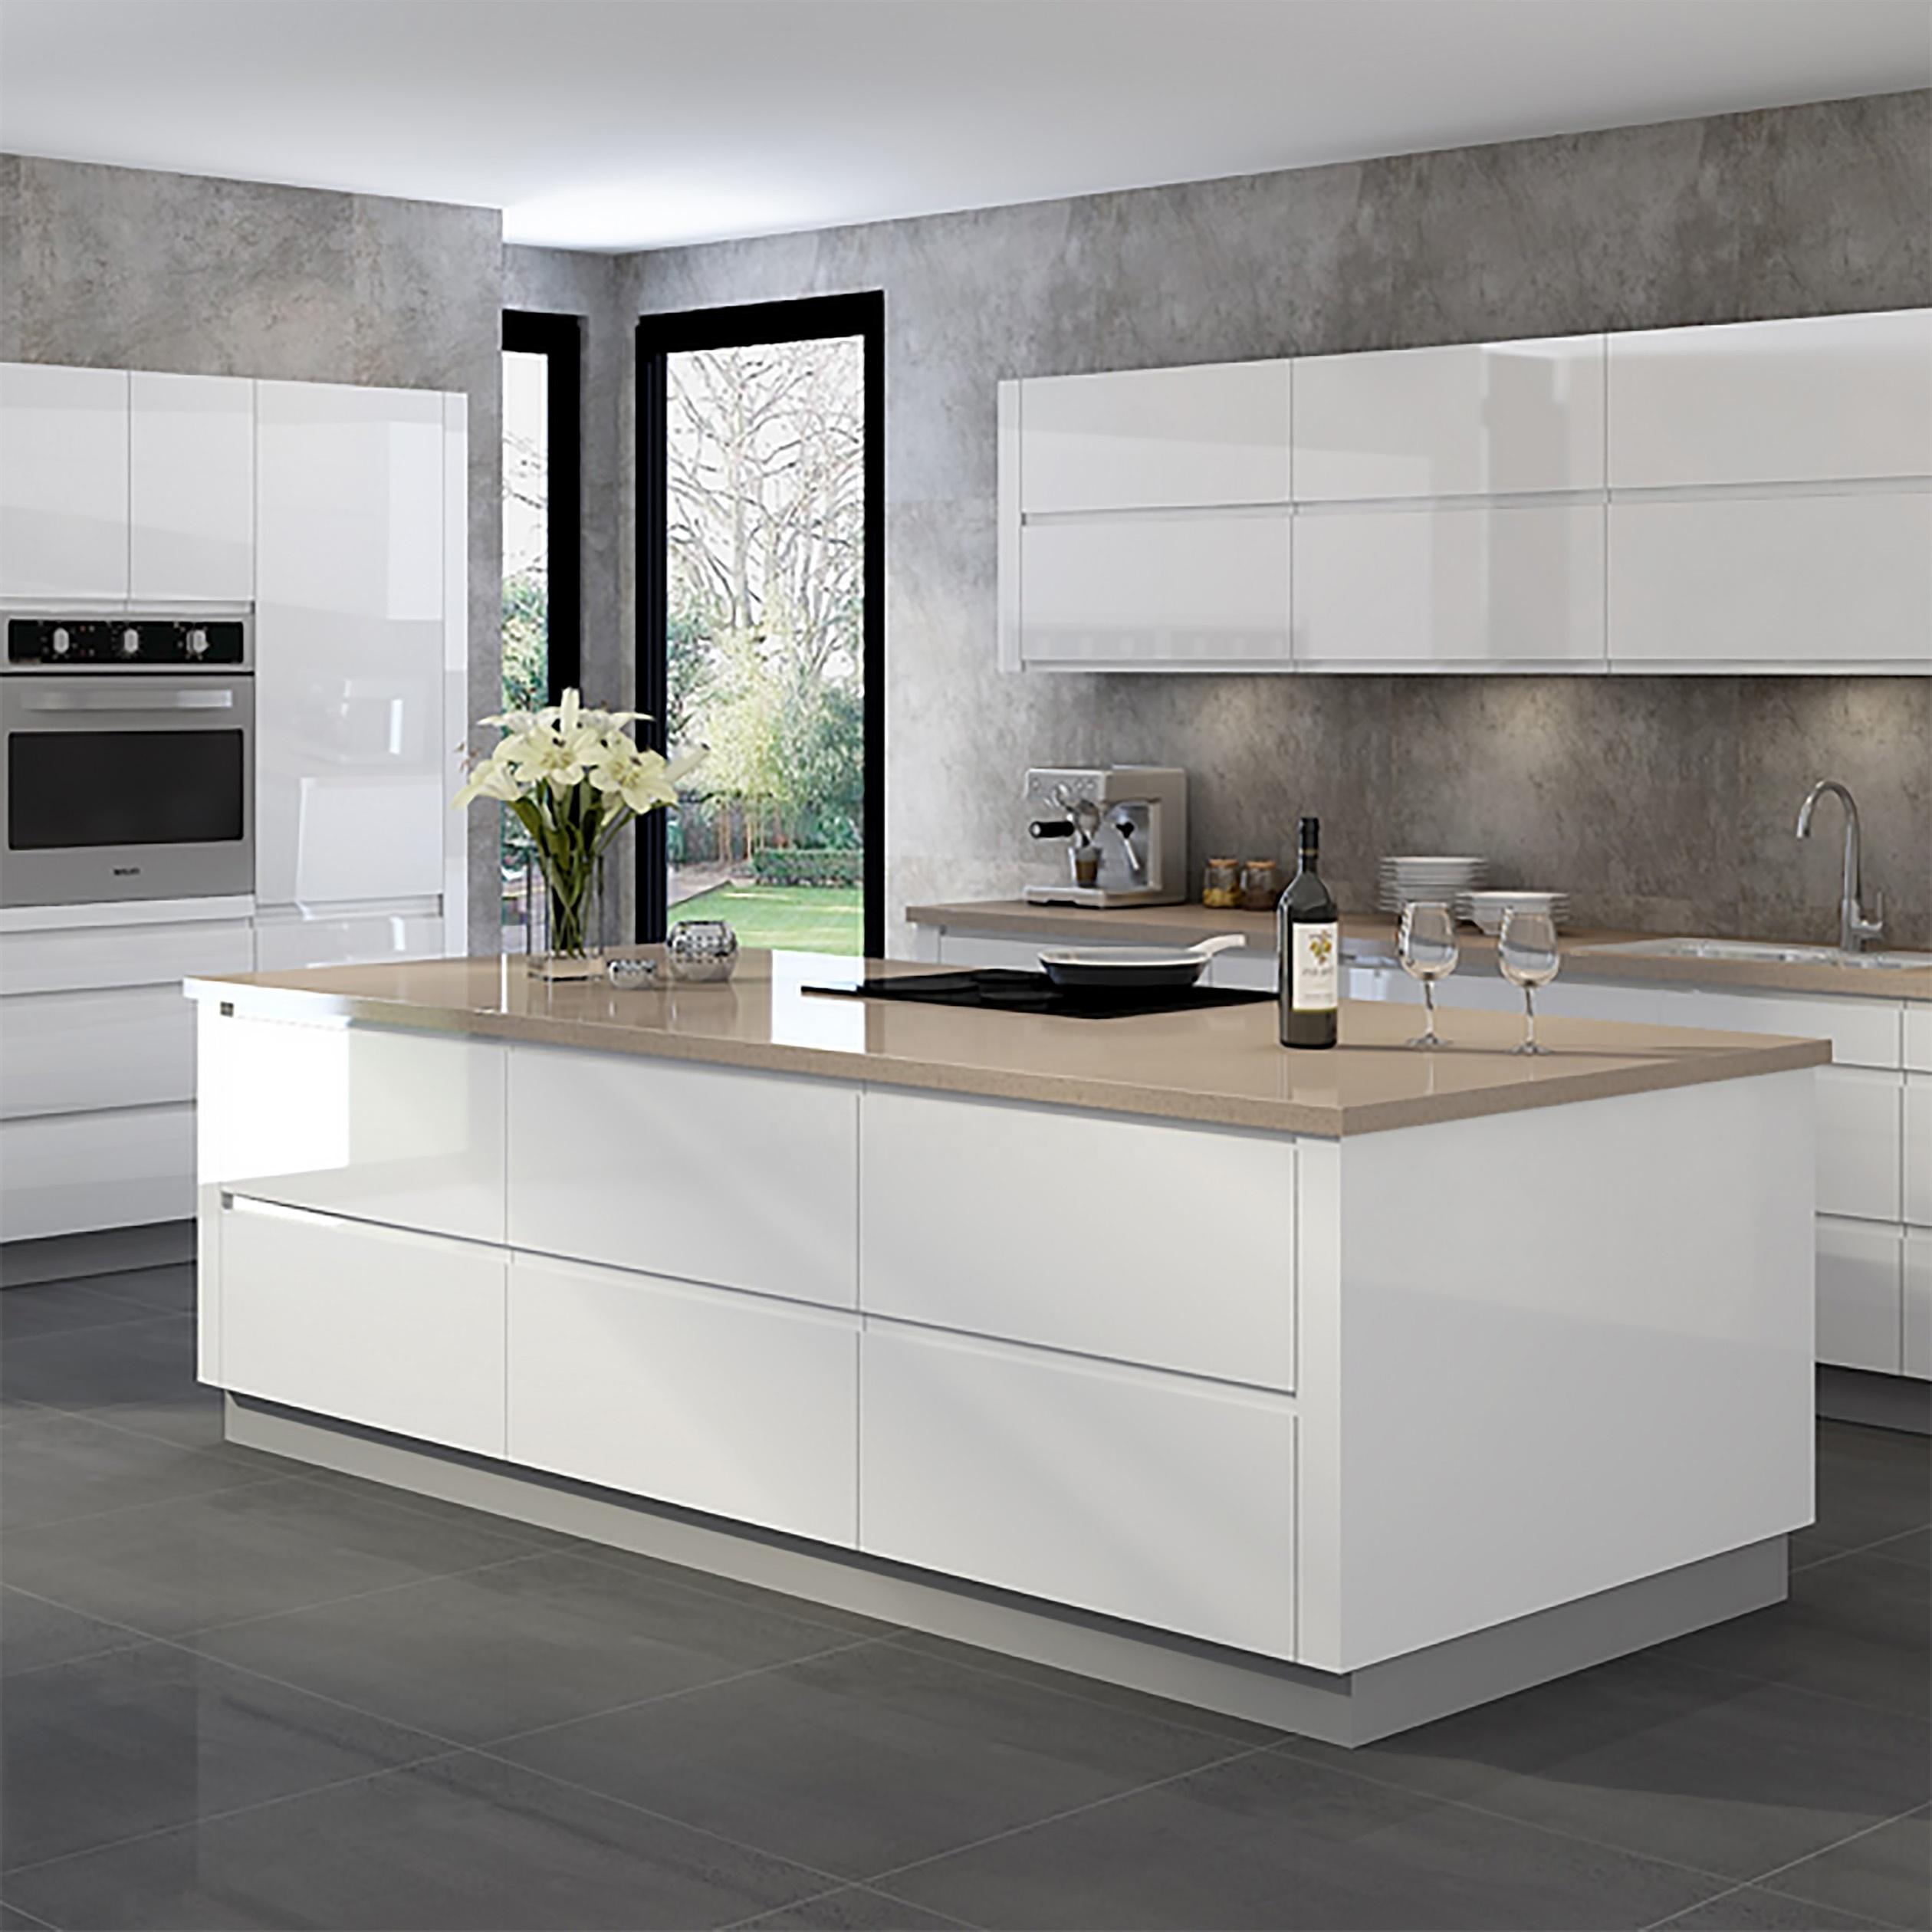 Vermonhouzz Custom White High Glossy Lacquer Door With Handleless ...